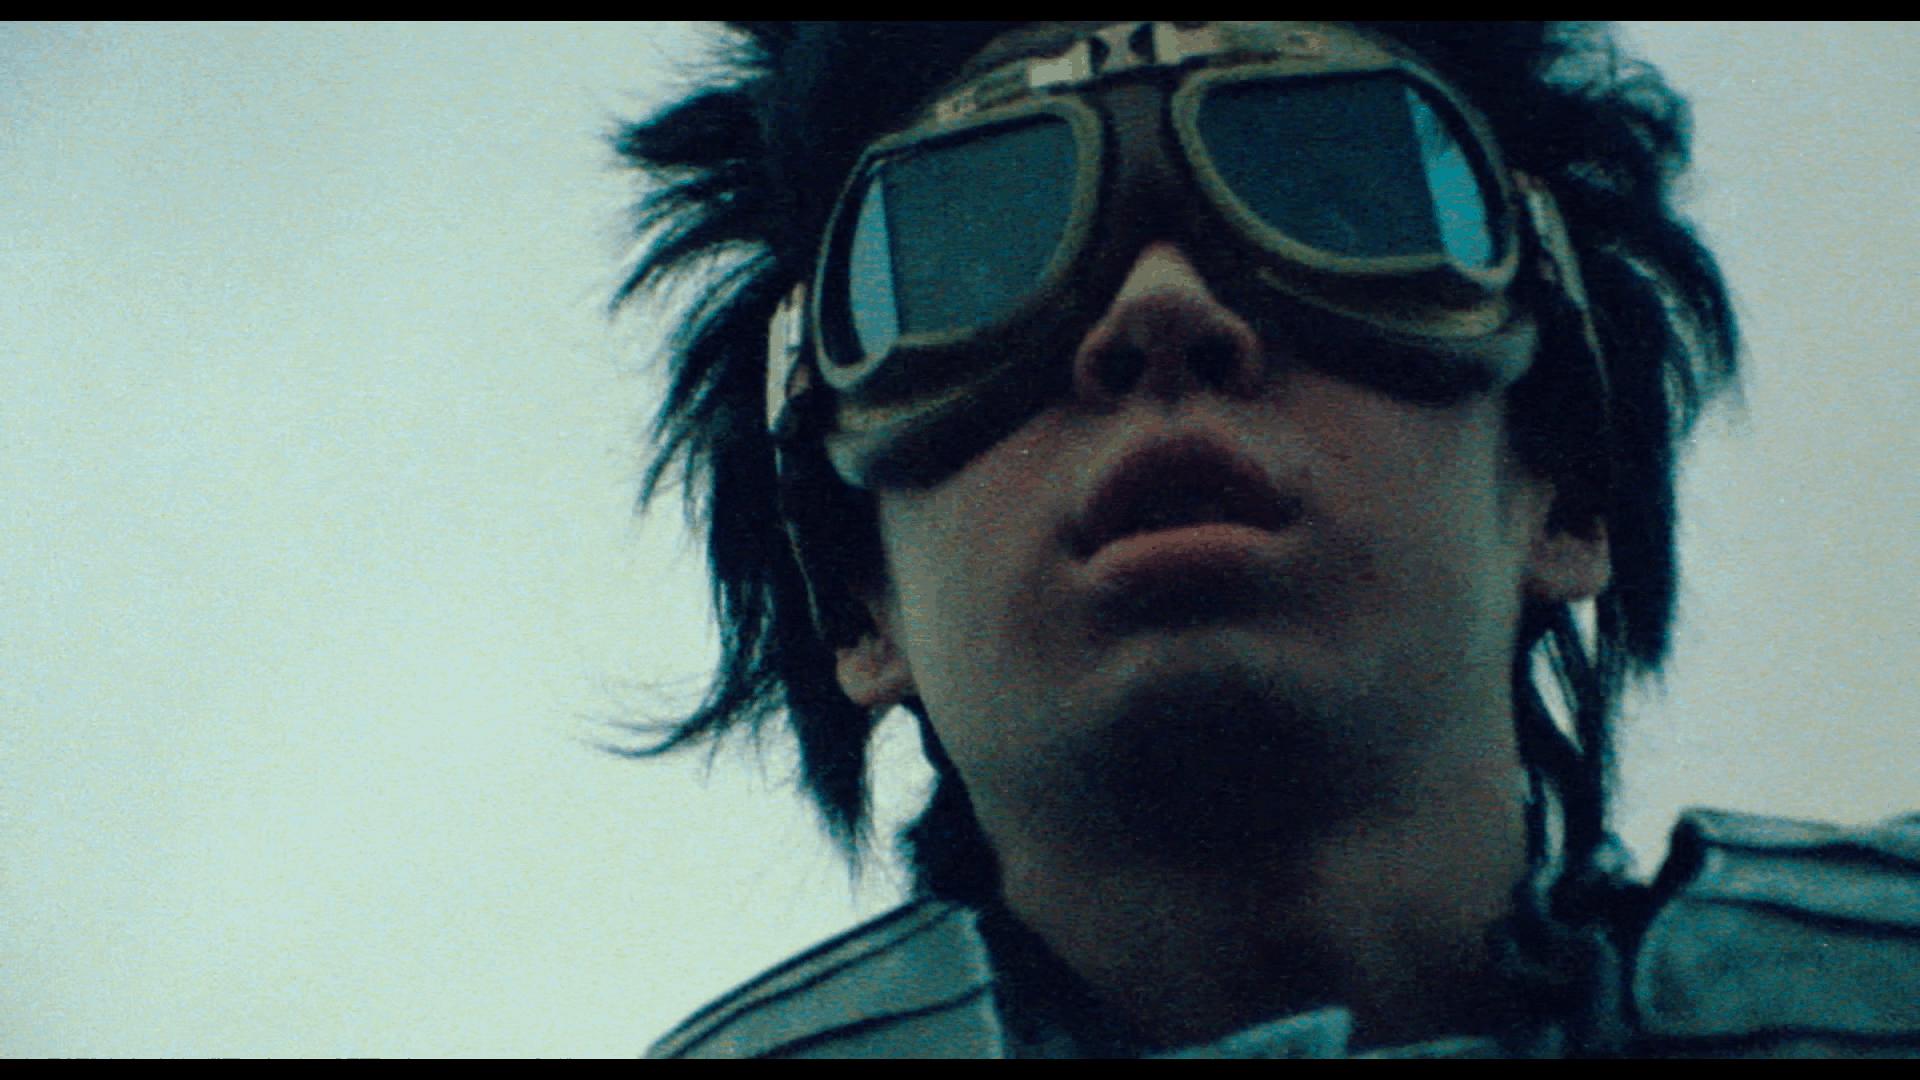 Cyber Monday 2020 Blu-ray and DVD review bonanza! 4